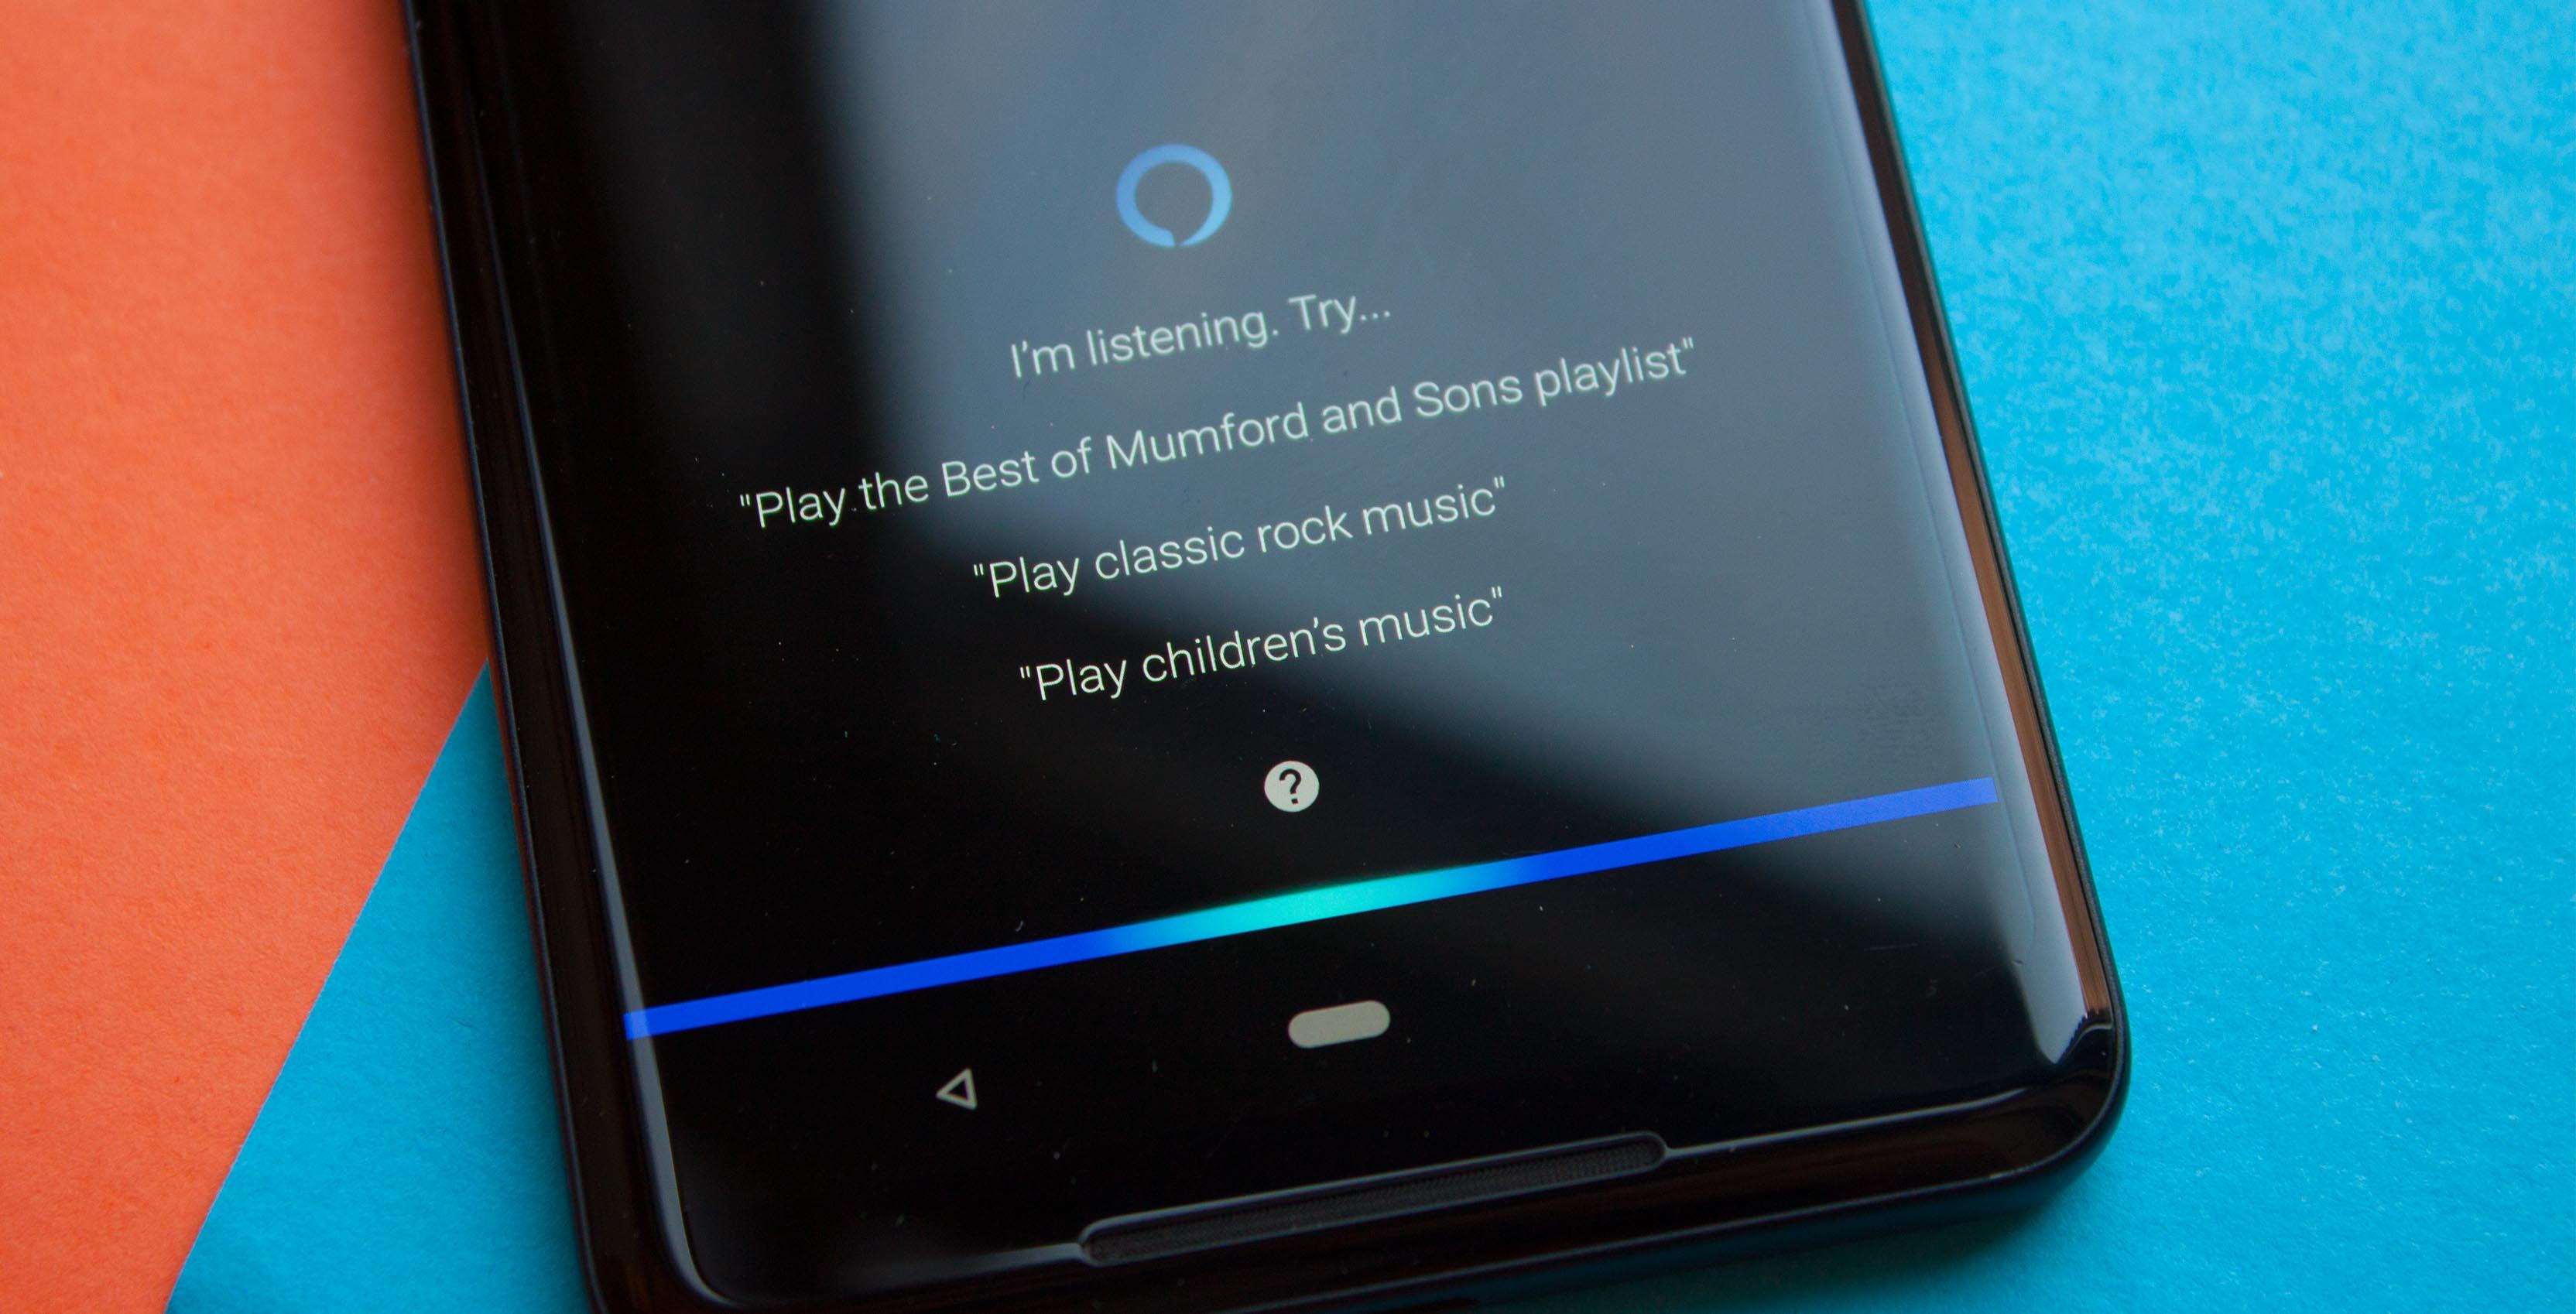 Amazon Alexa in the Music app